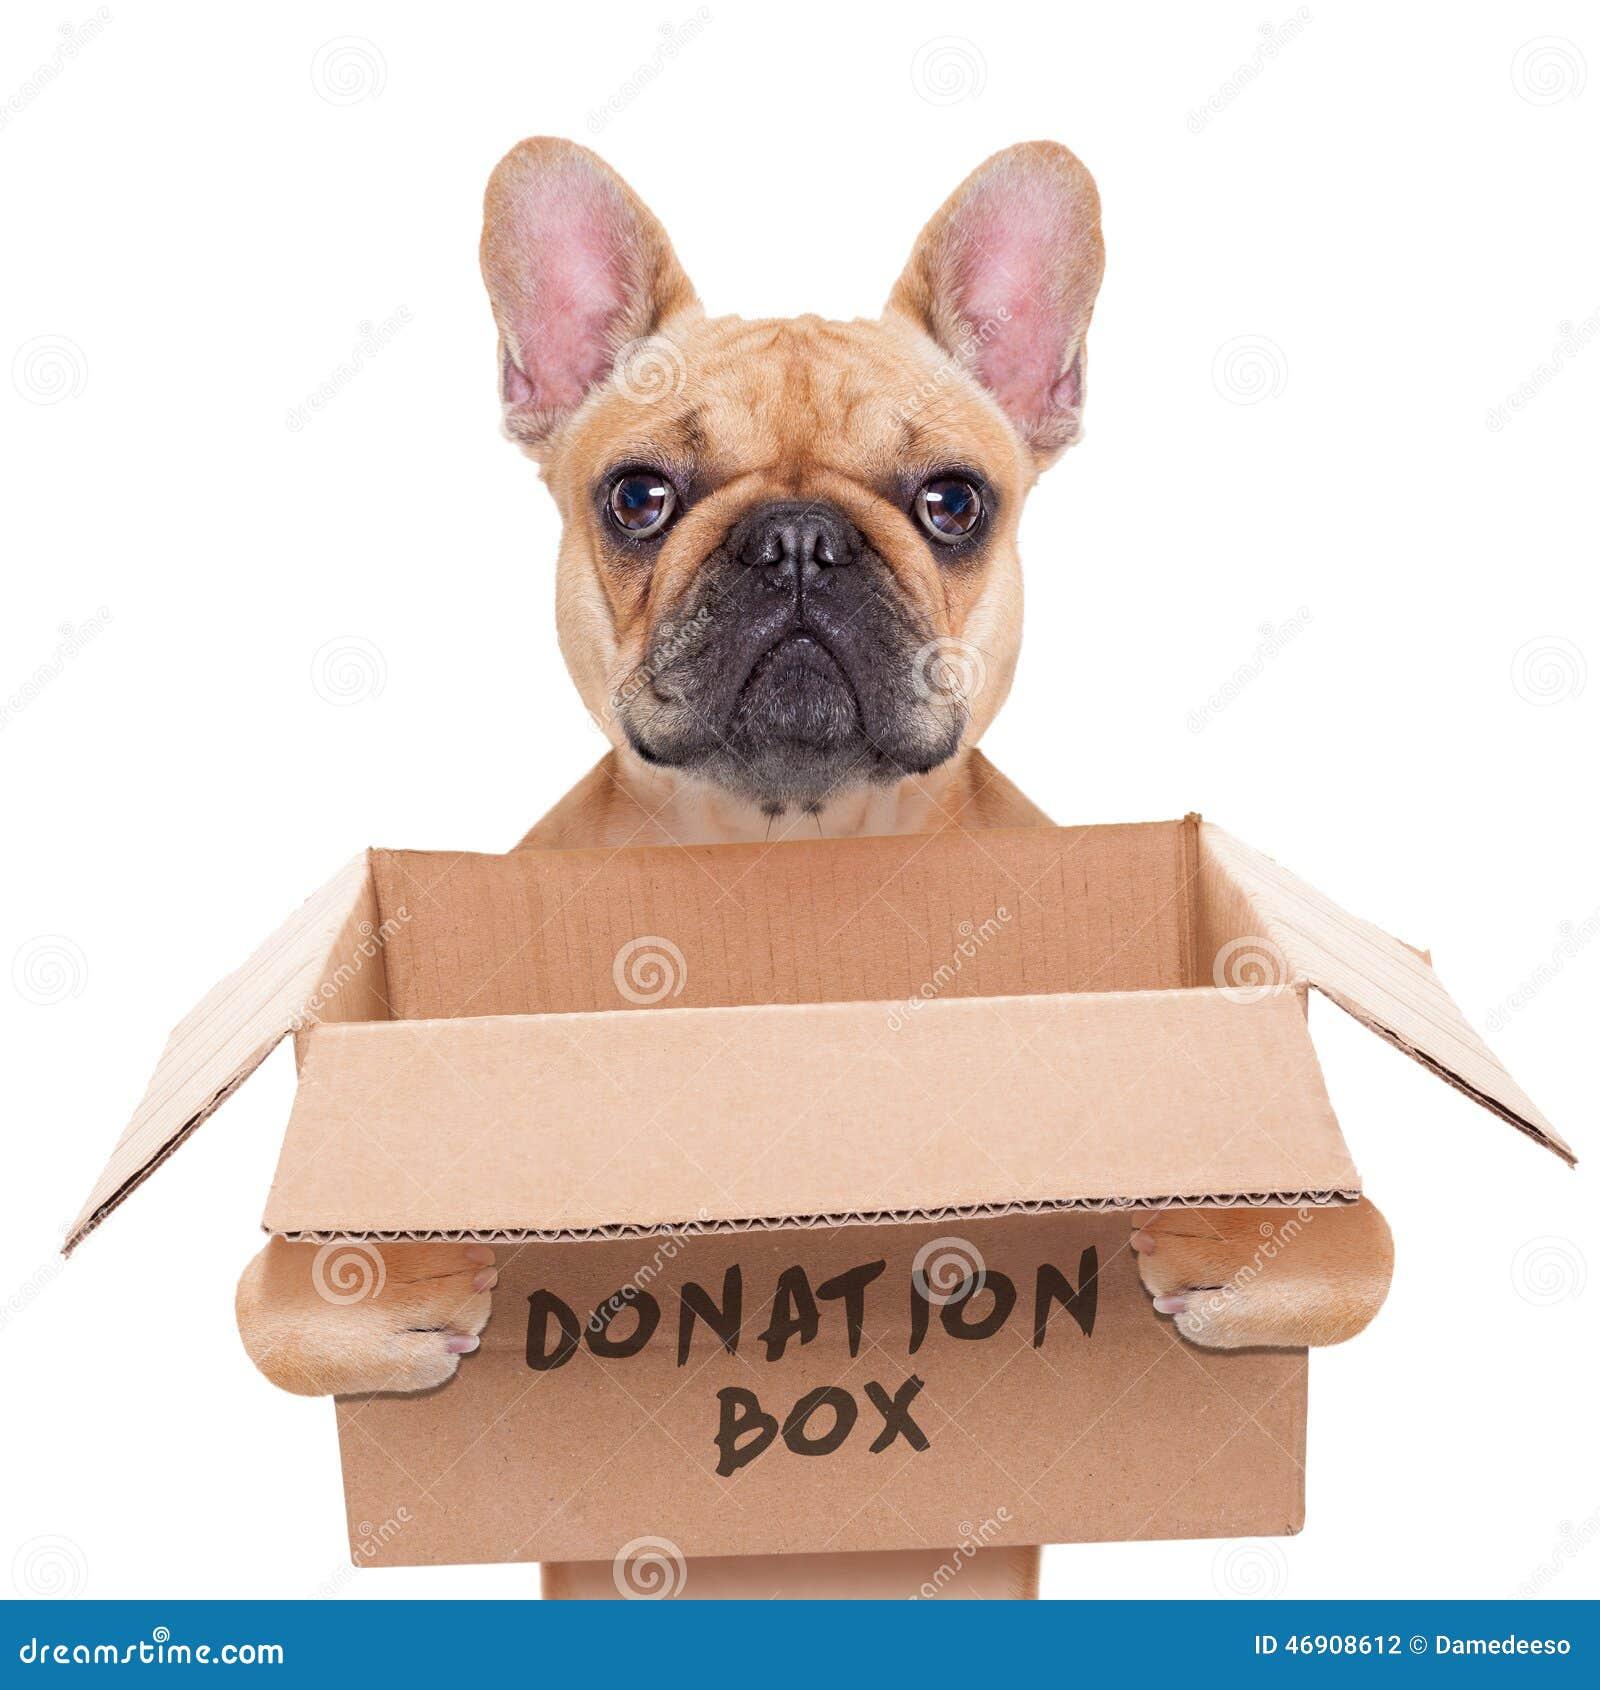 Donation box dog